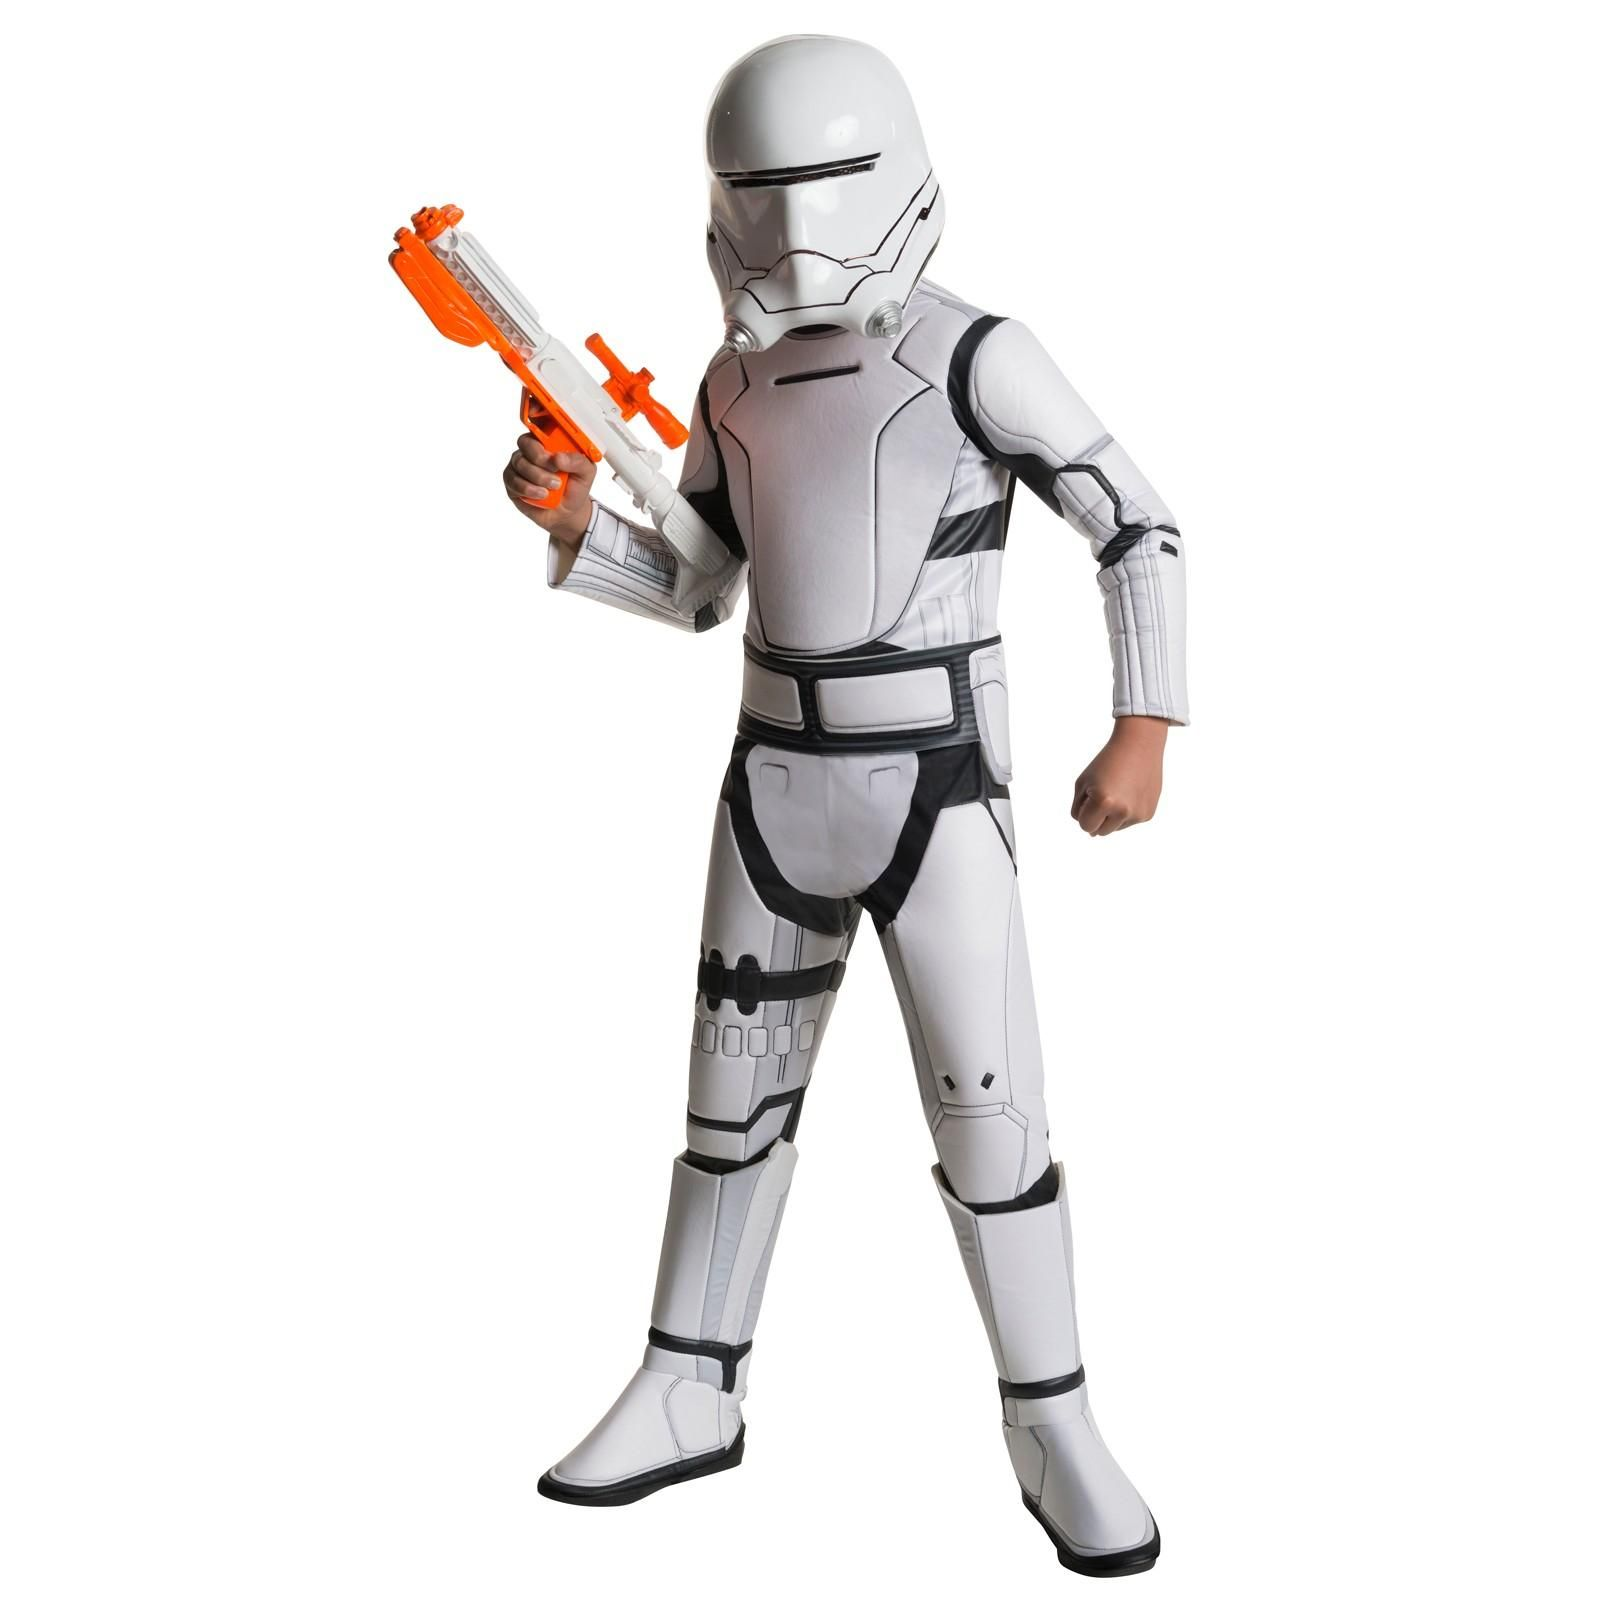 Star Wars: The Force Awakens - Boys Flametrooper Super Deluxe ...